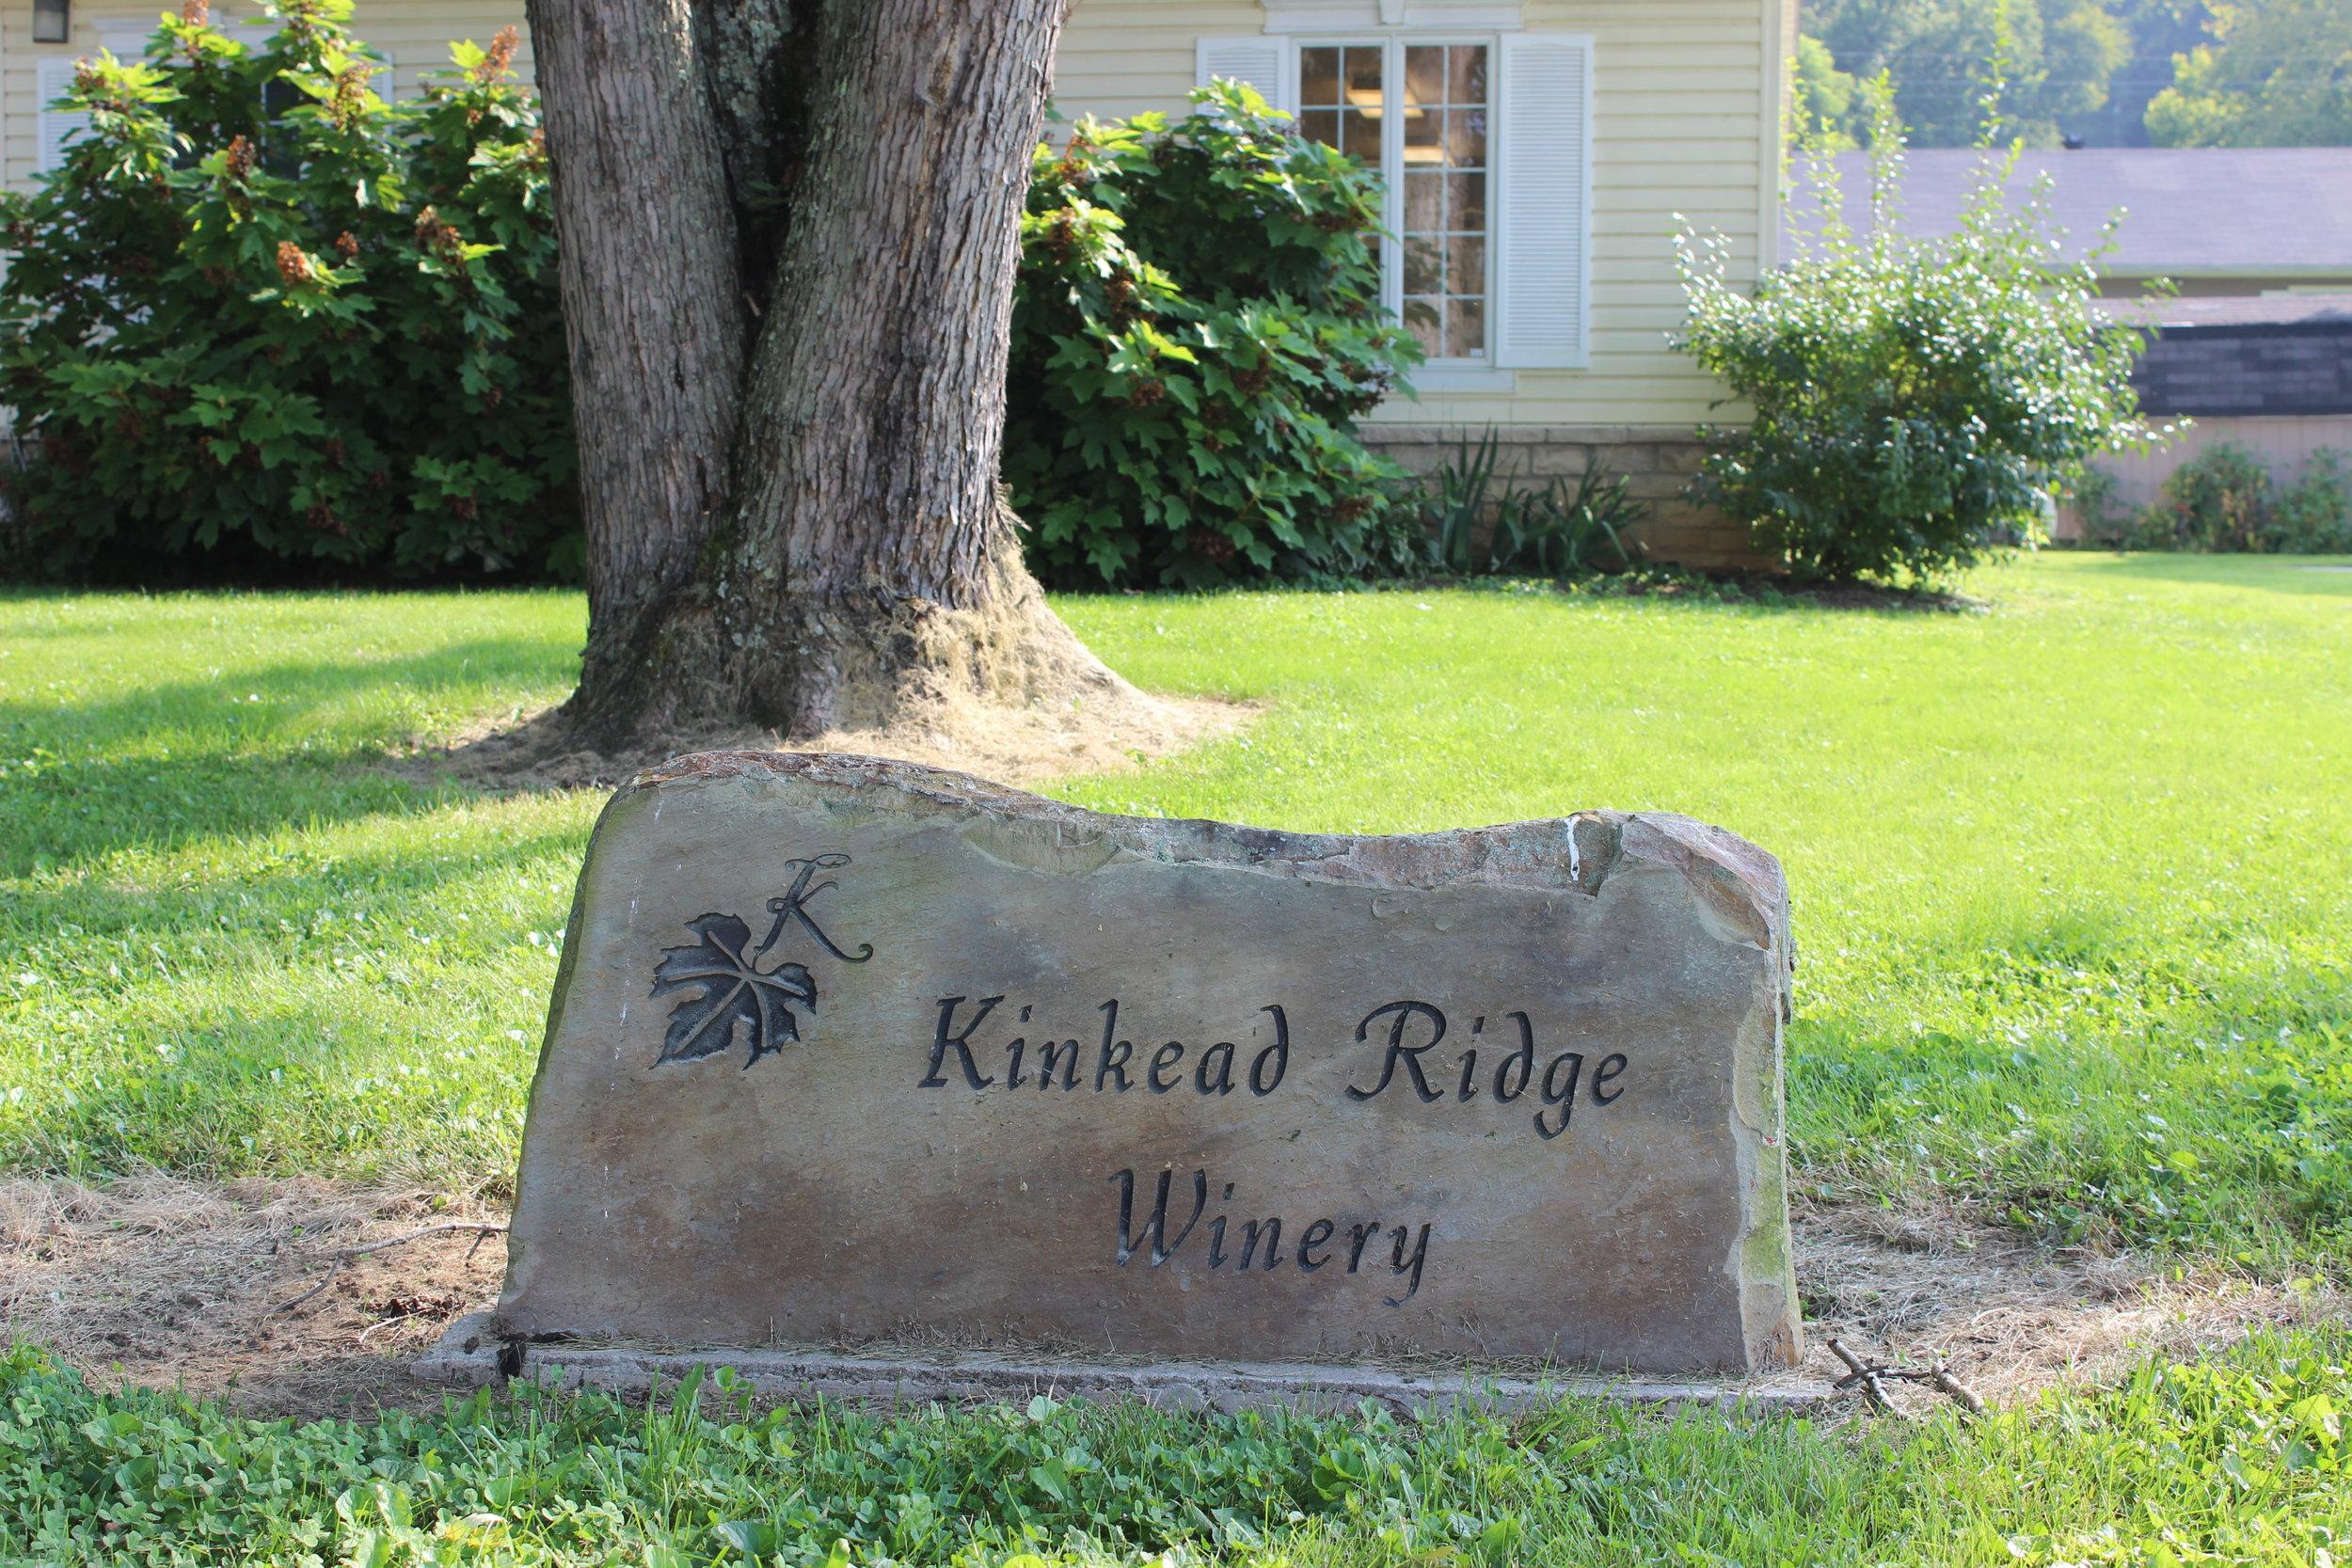 Kinkead Ridge Winery